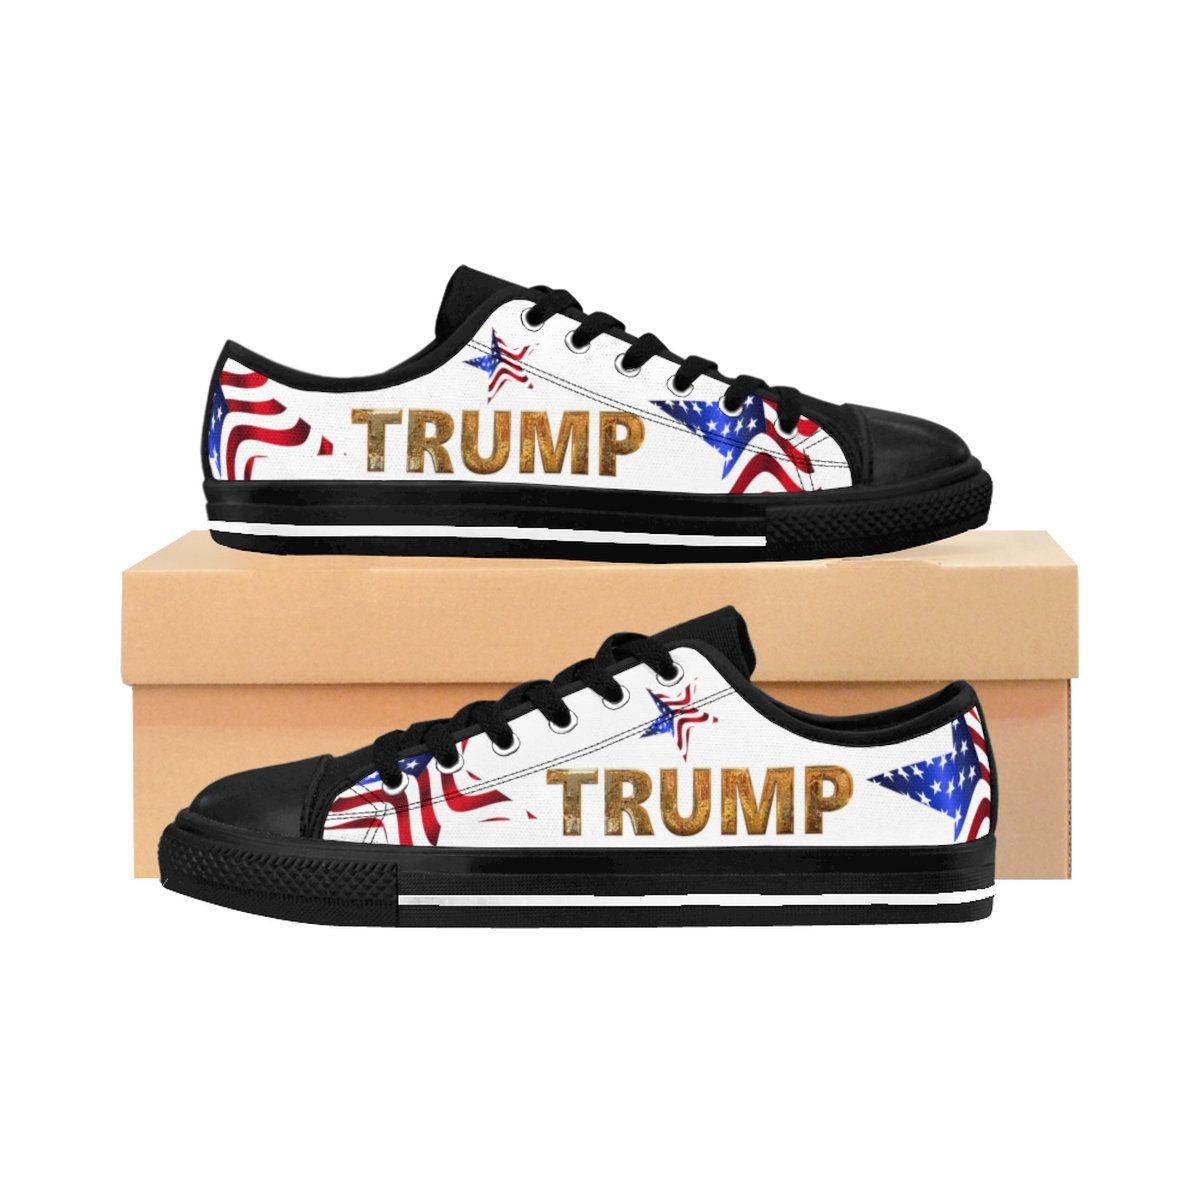 Trump Sneakers Donaldtrump Sneakers Trump2020 Trump Maga Patriotic Patriotic Sneakers Sneakers Mens Tennis Shoes